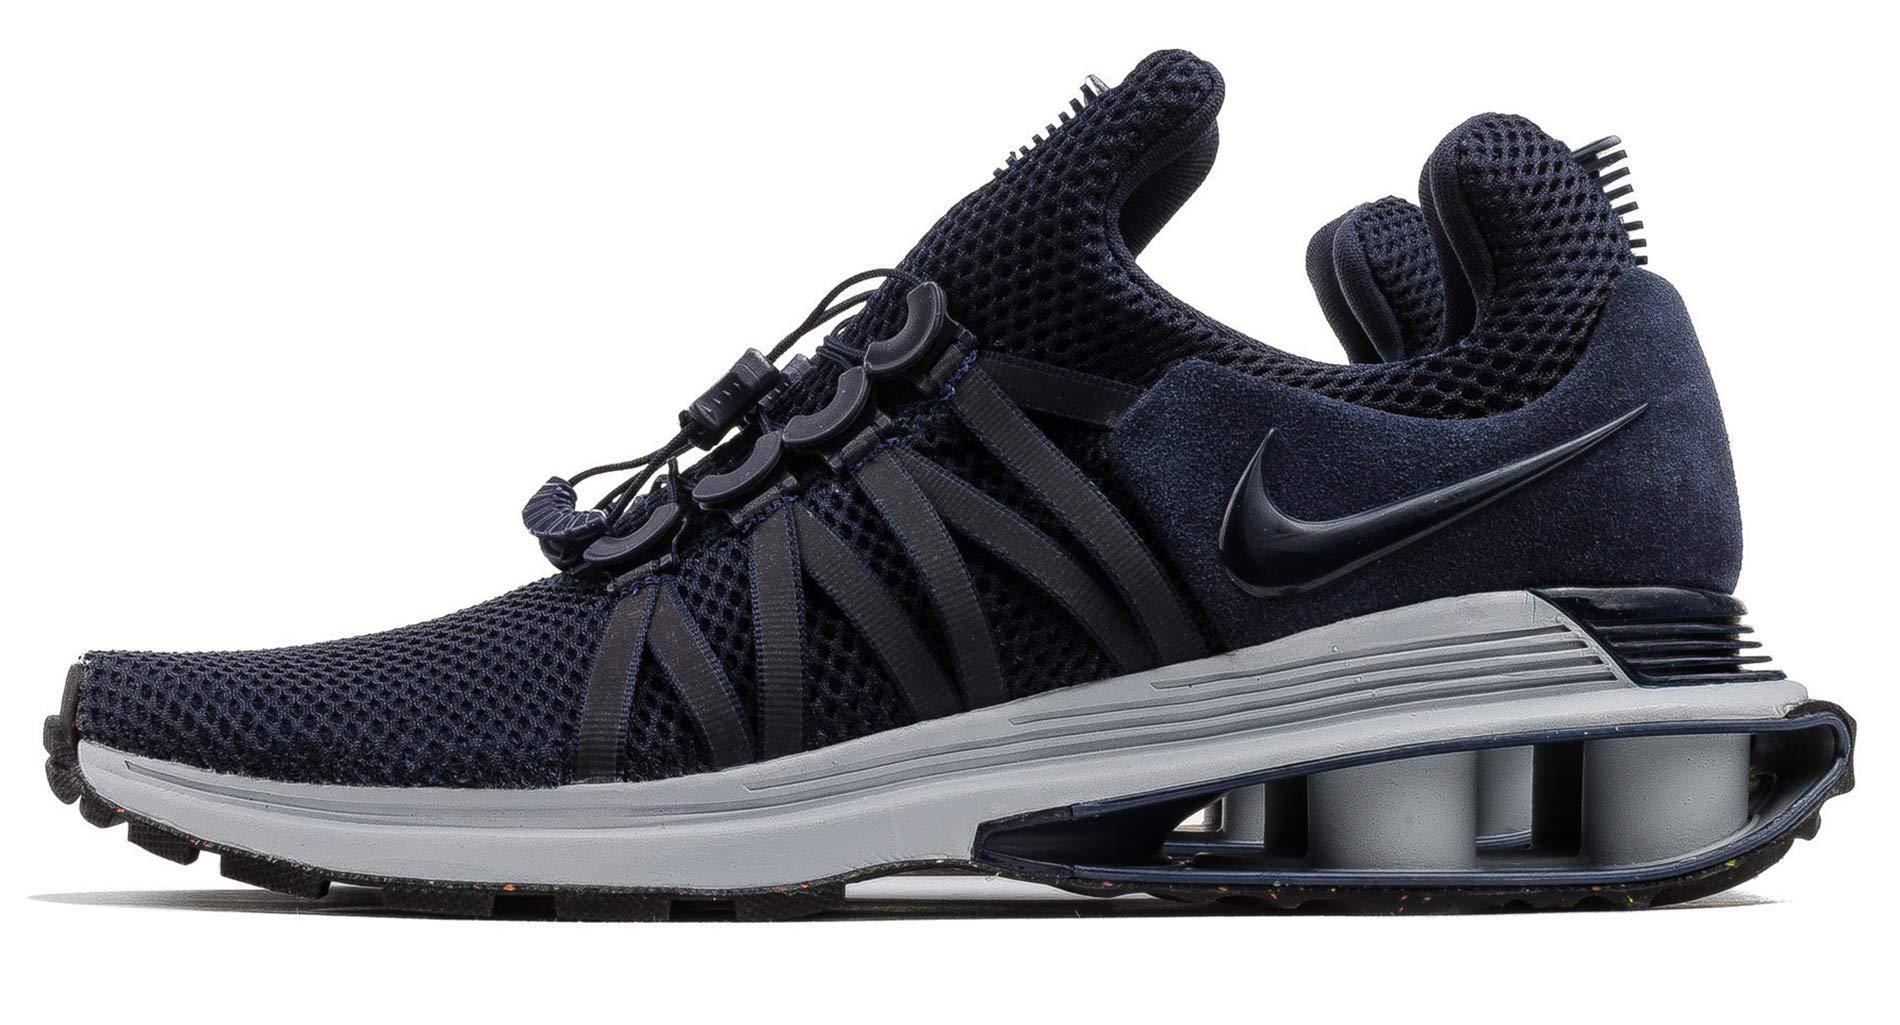 90911c47629 Galleon - NIKE Shox Gravity Mens Running Shoes (10)